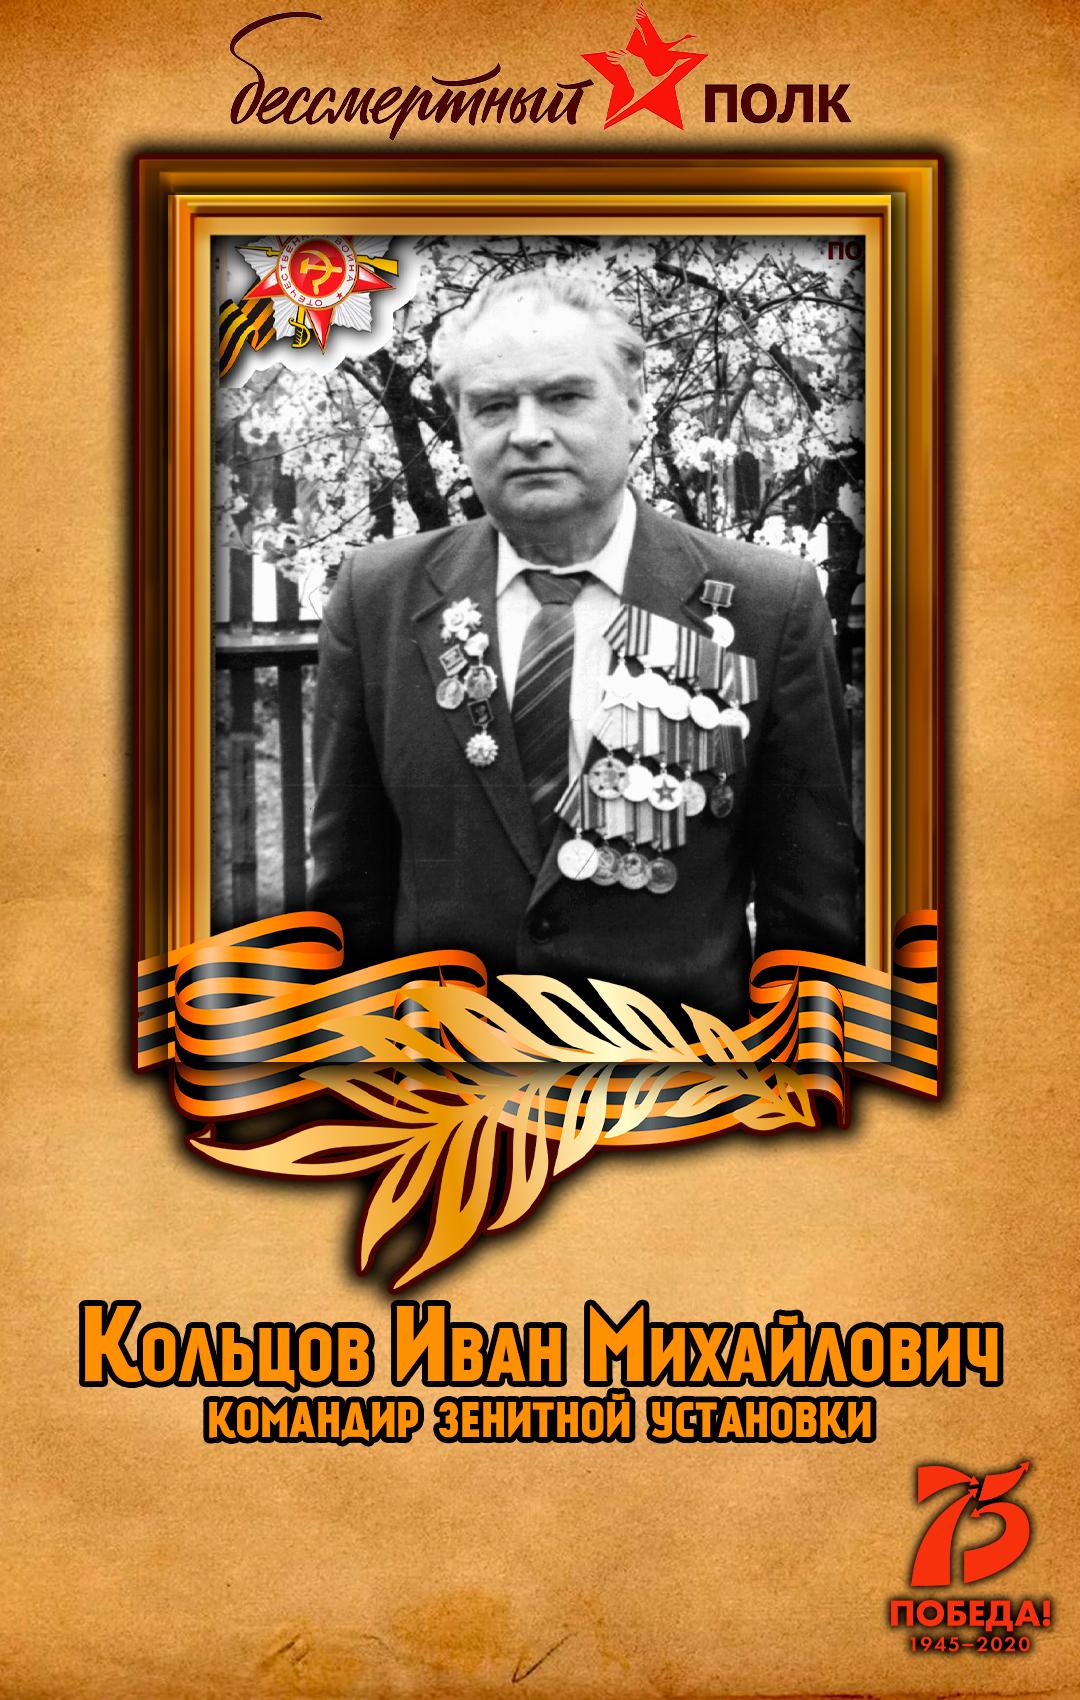 Кольцов-Иван-Михайлович